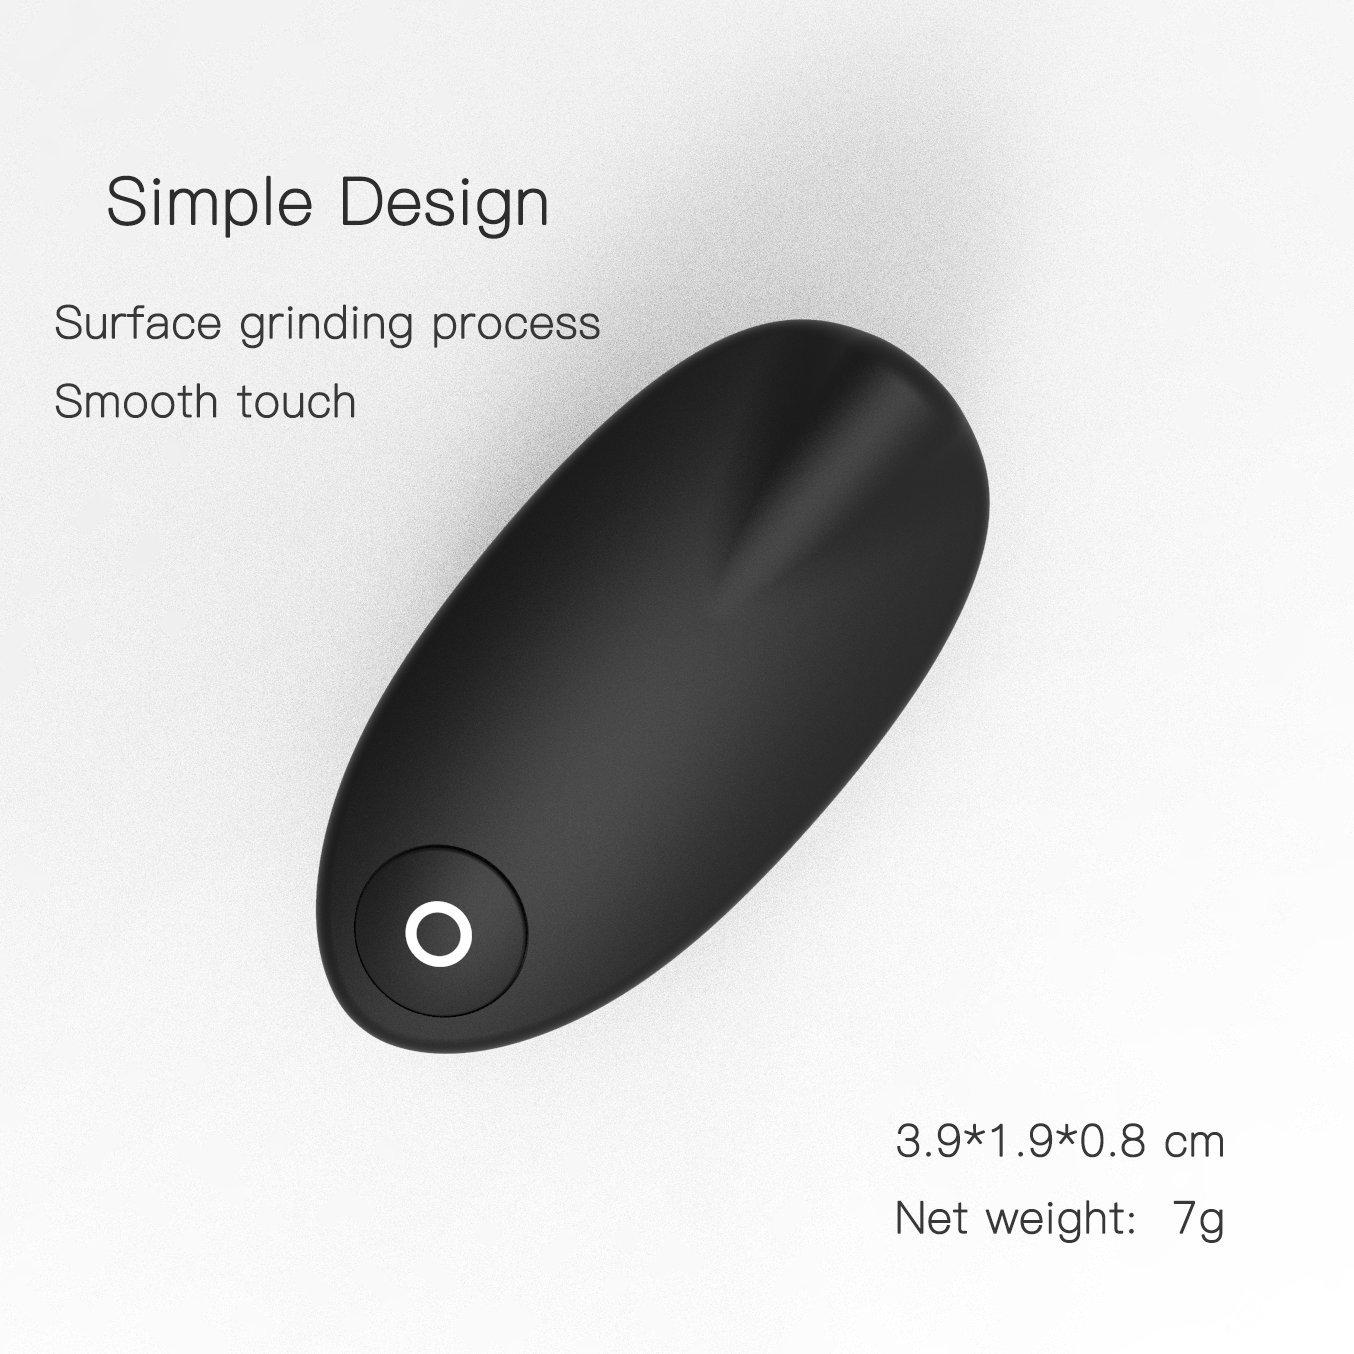 D/&K Wireless Presenter RF 2.4GHz Presentation Finger Ring Remote Pointer PowerPoint PPT Slides Clicker USB Rechargeable